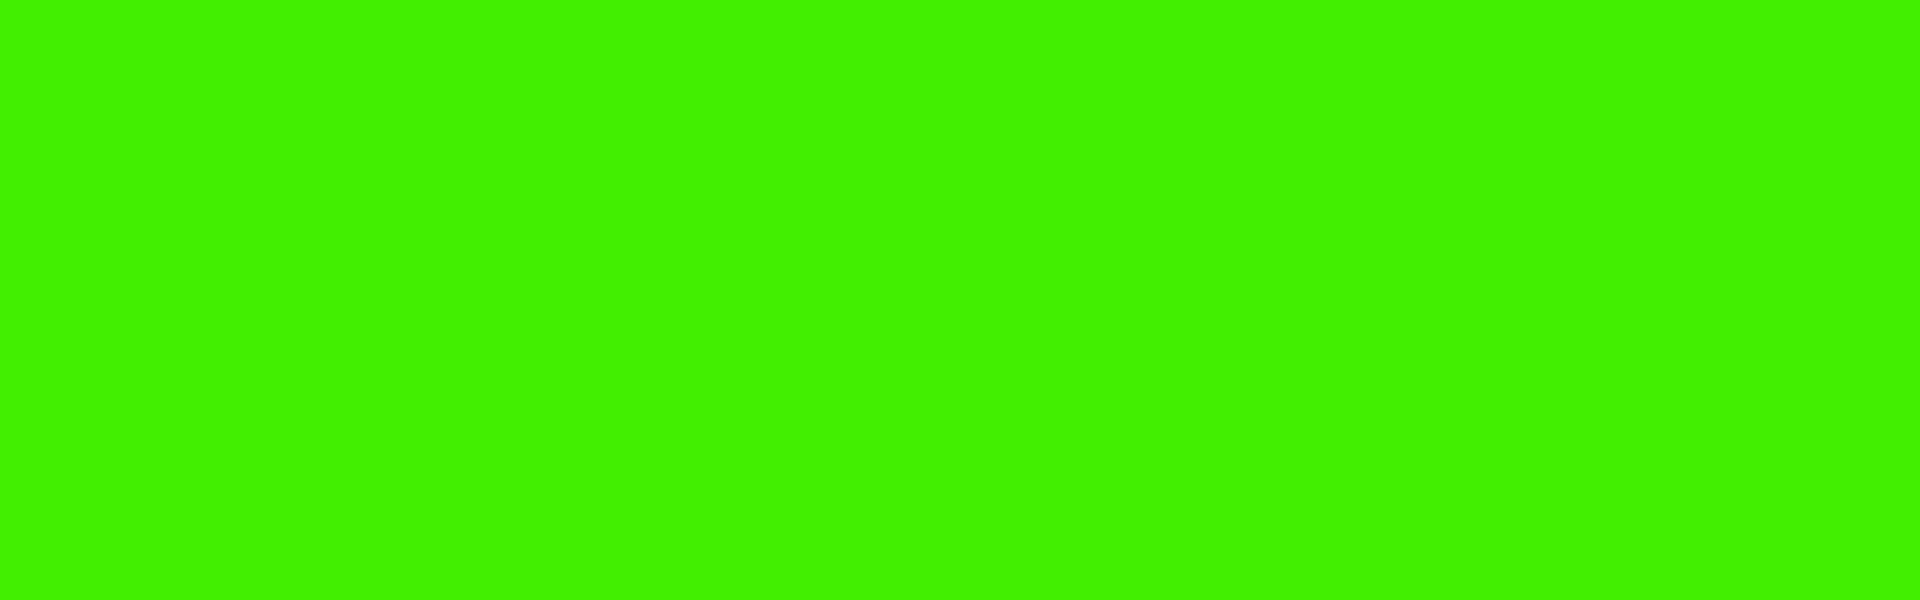 Green-background